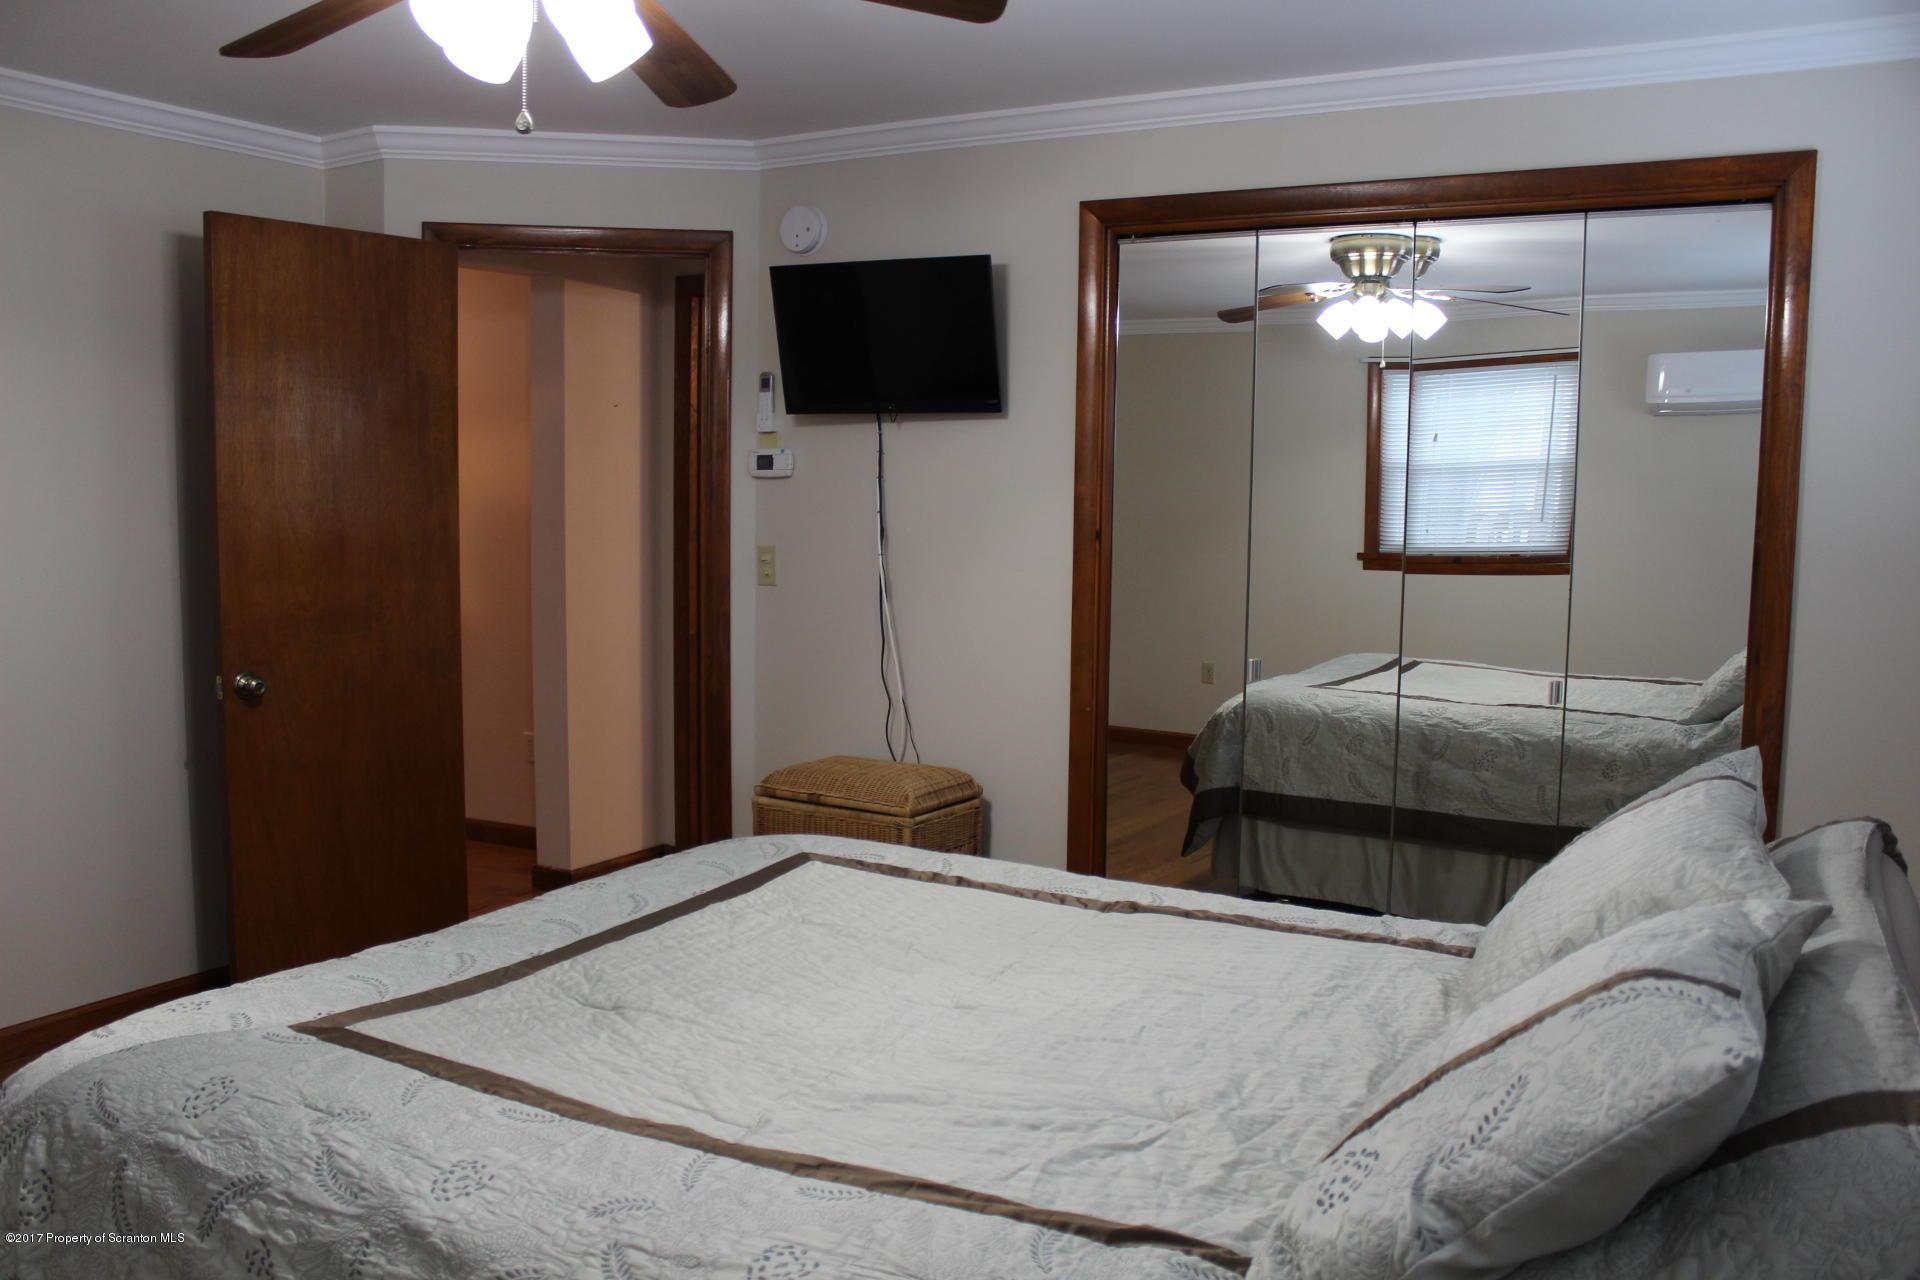 1310 Prospect Ave, Scranton, Pennsylvania 18505, 4 Bedrooms Bedrooms, 9 Rooms Rooms,3 BathroomsBathrooms,Single Family,For Sale,Prospect,17-557